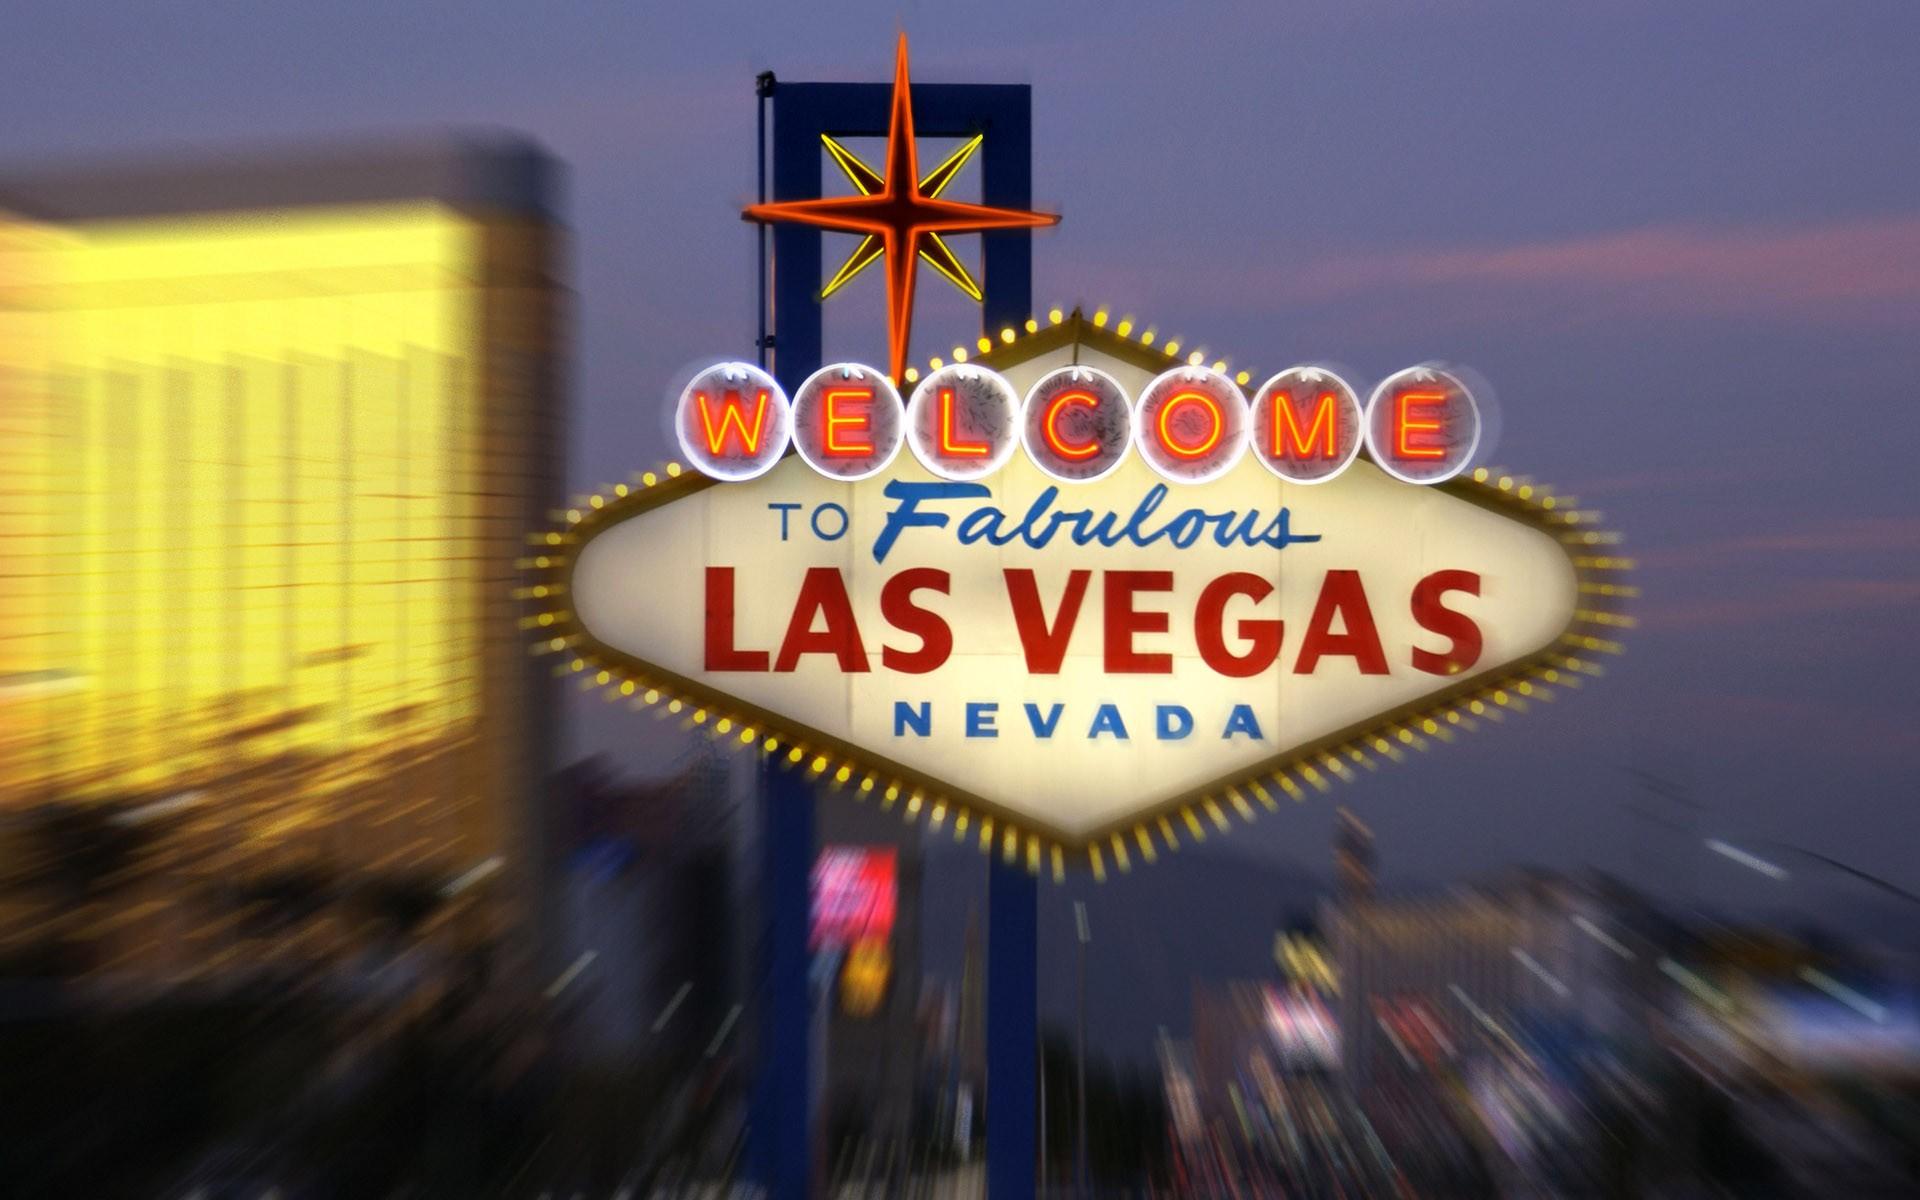 Bello casino las luck mario vegas vegas waitress astrological best date gambling money romance